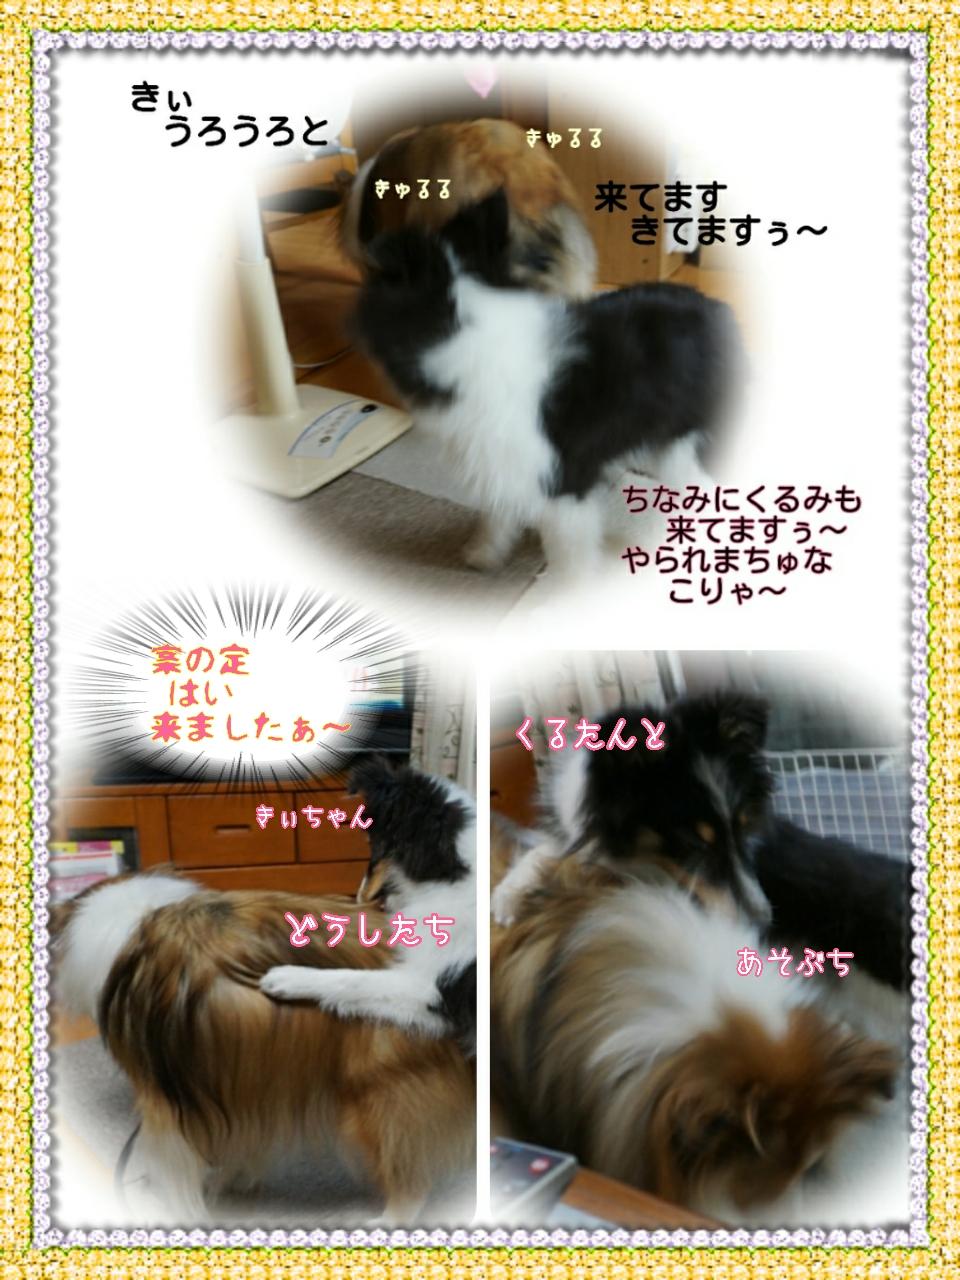 2015-07-30-12-21-58_deco.jpg